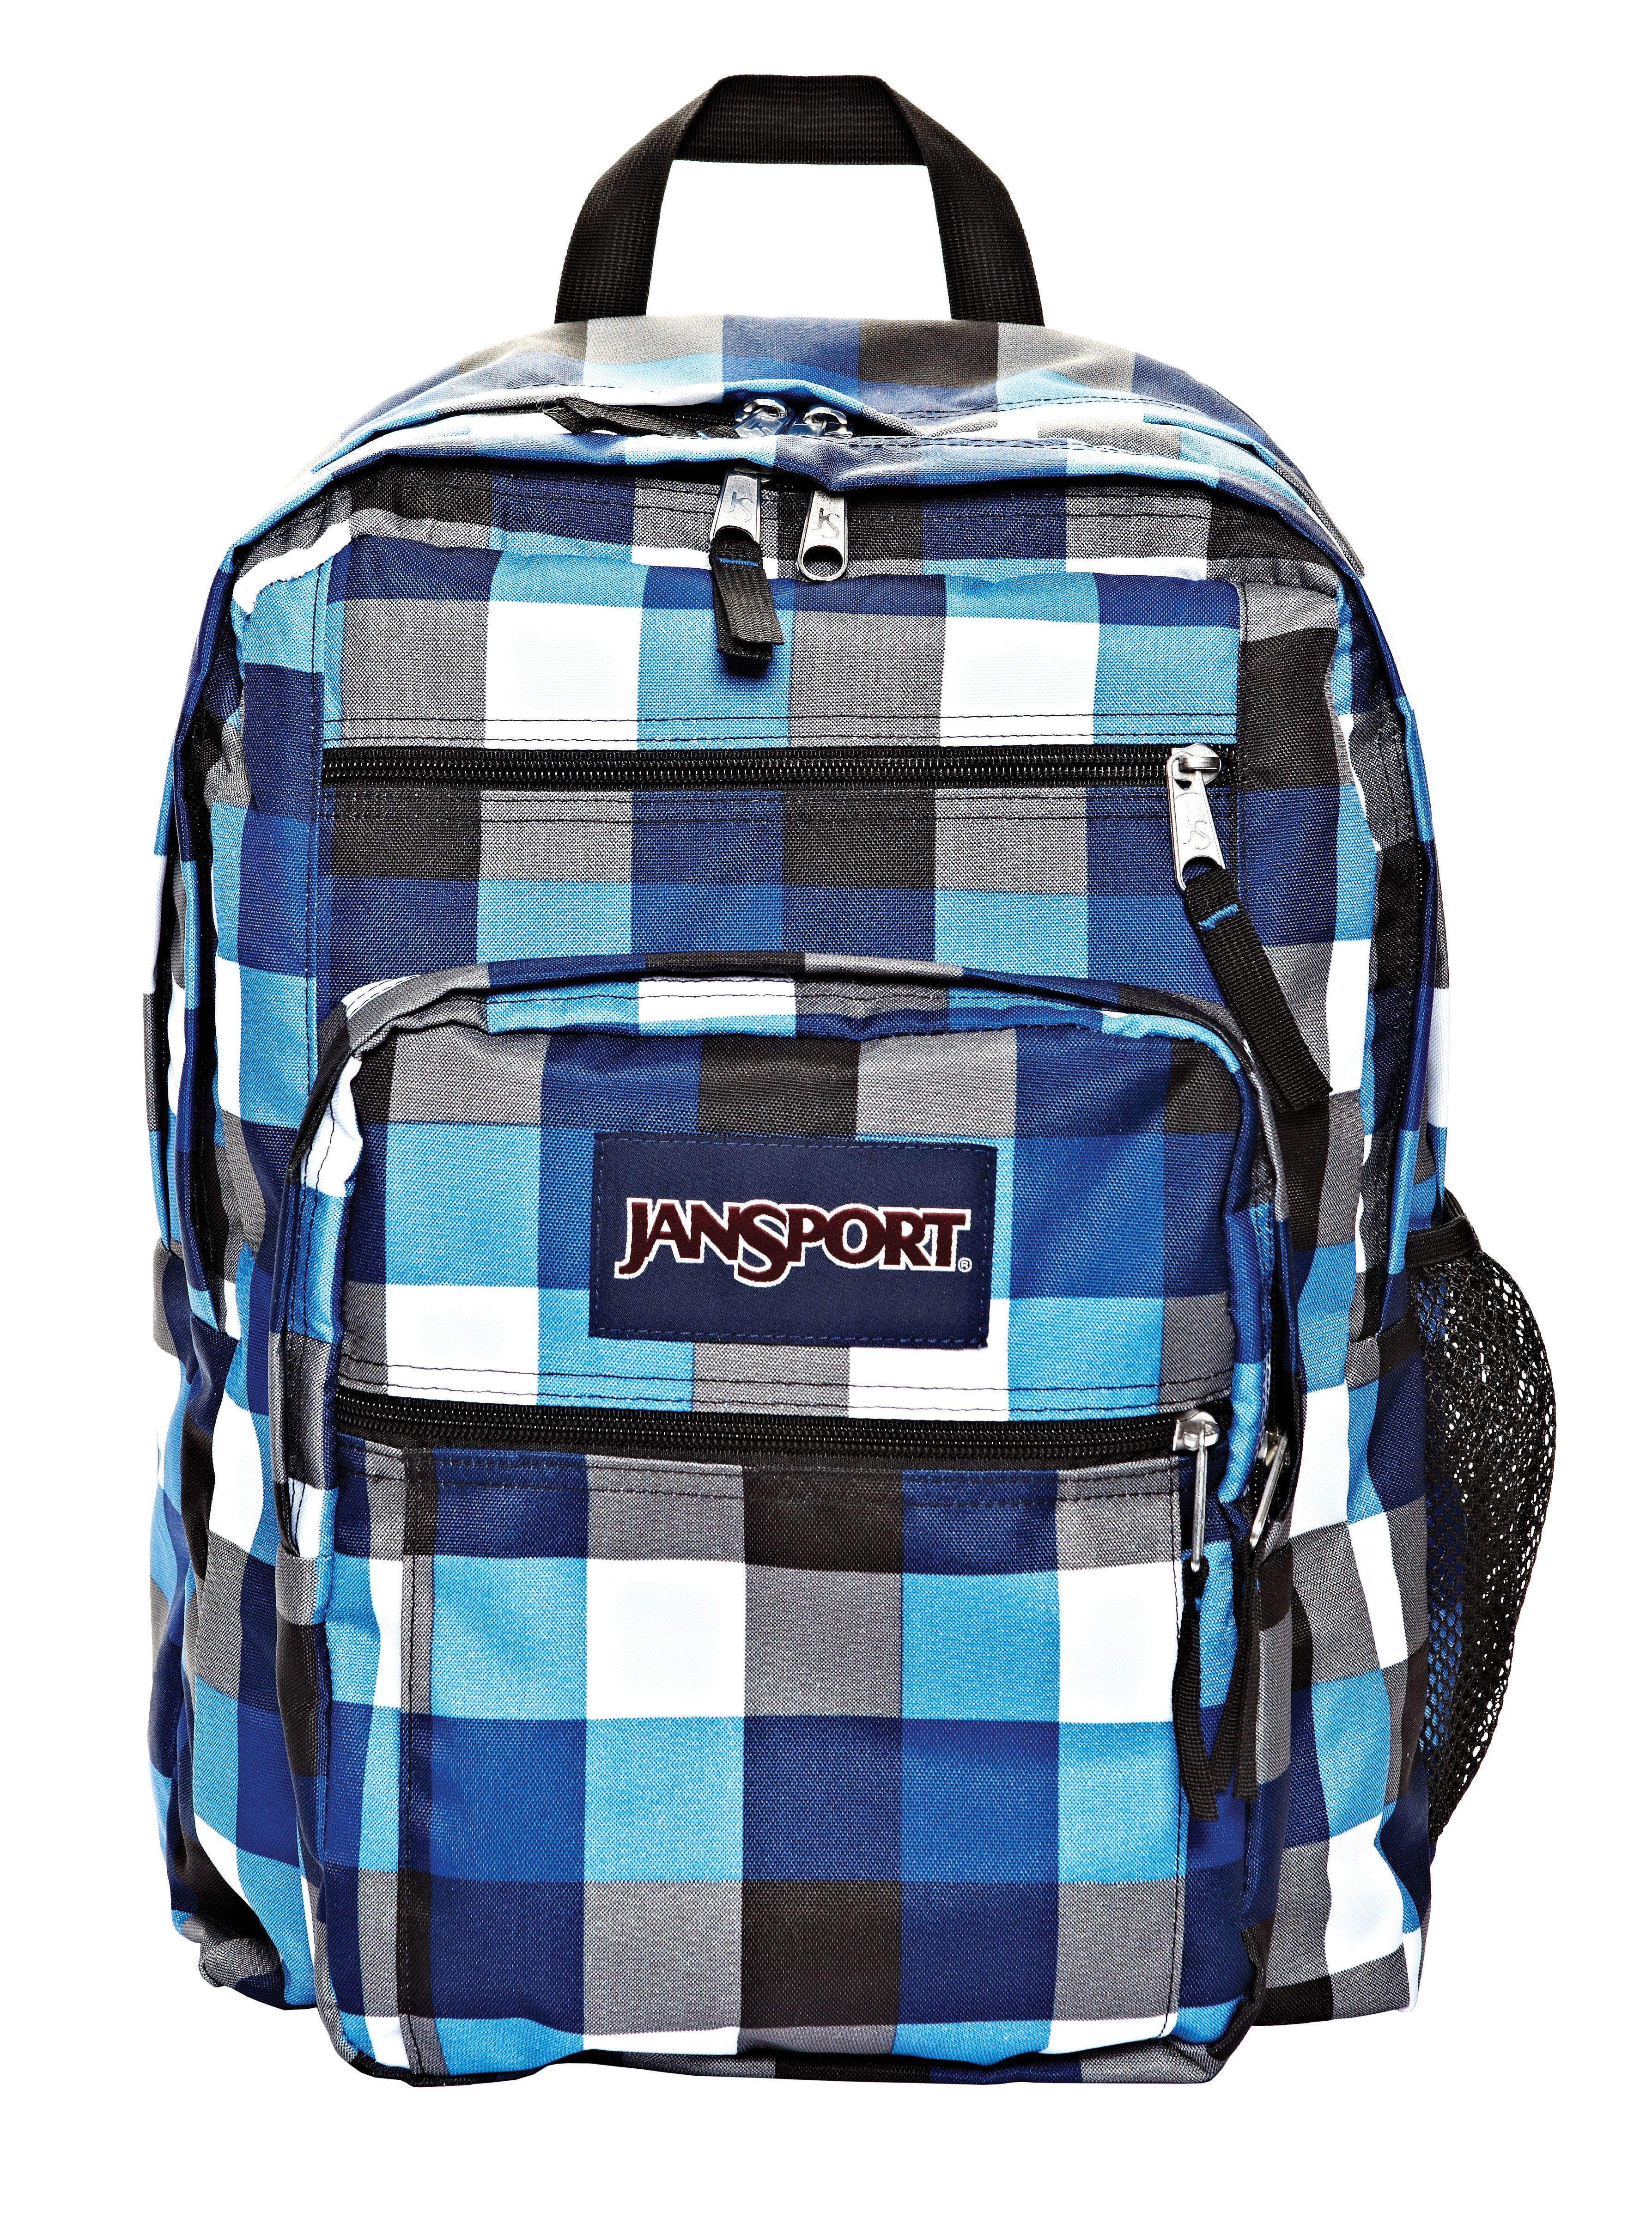 we love your plaid attitude jansport backpack jansport